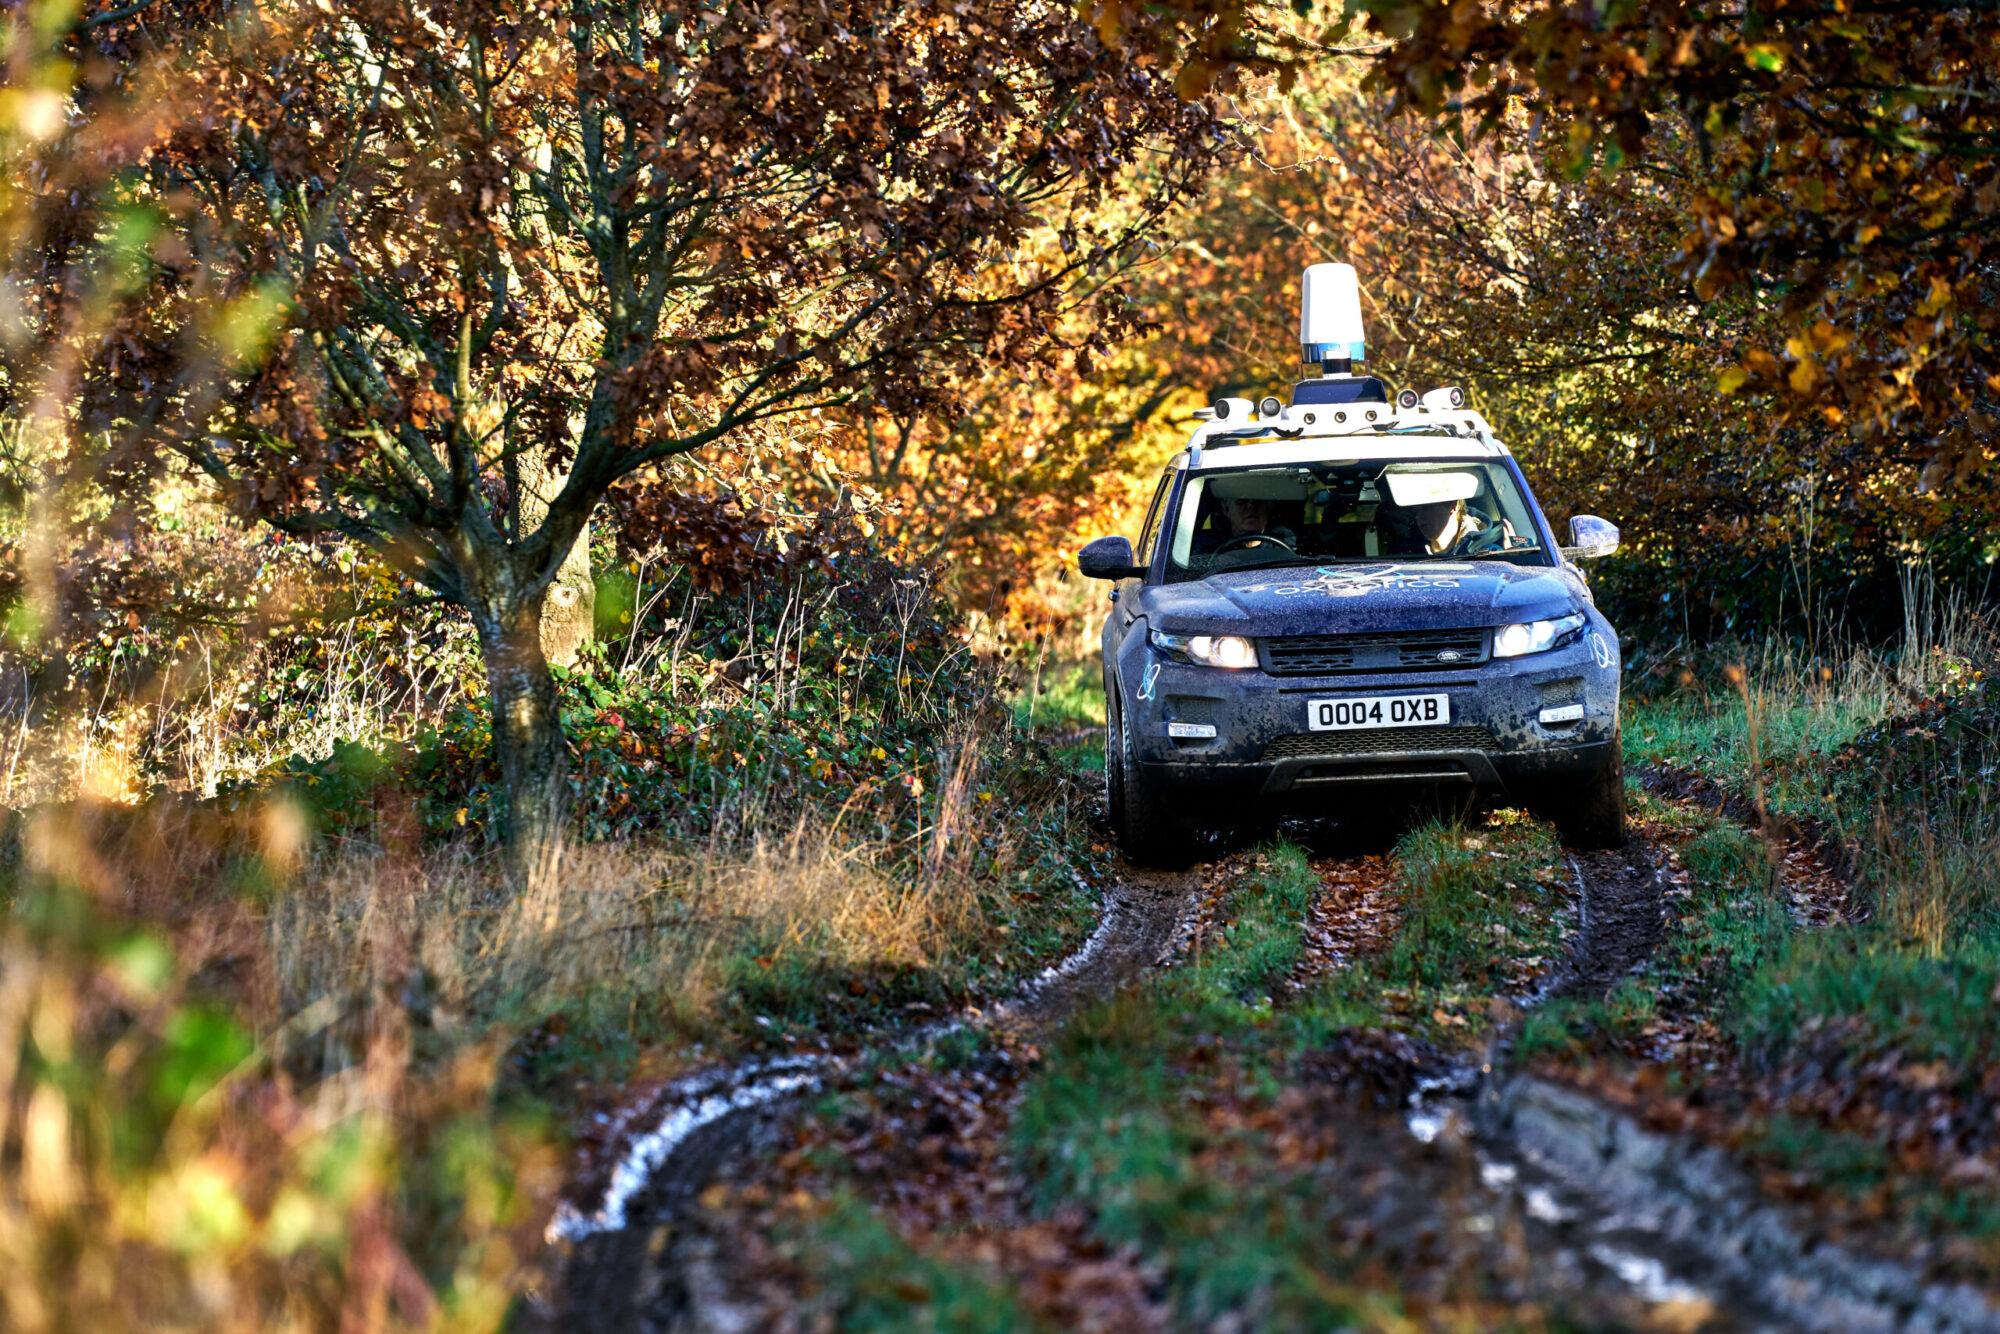 Oxbotica nets $47m to take autonomous vehicle software global